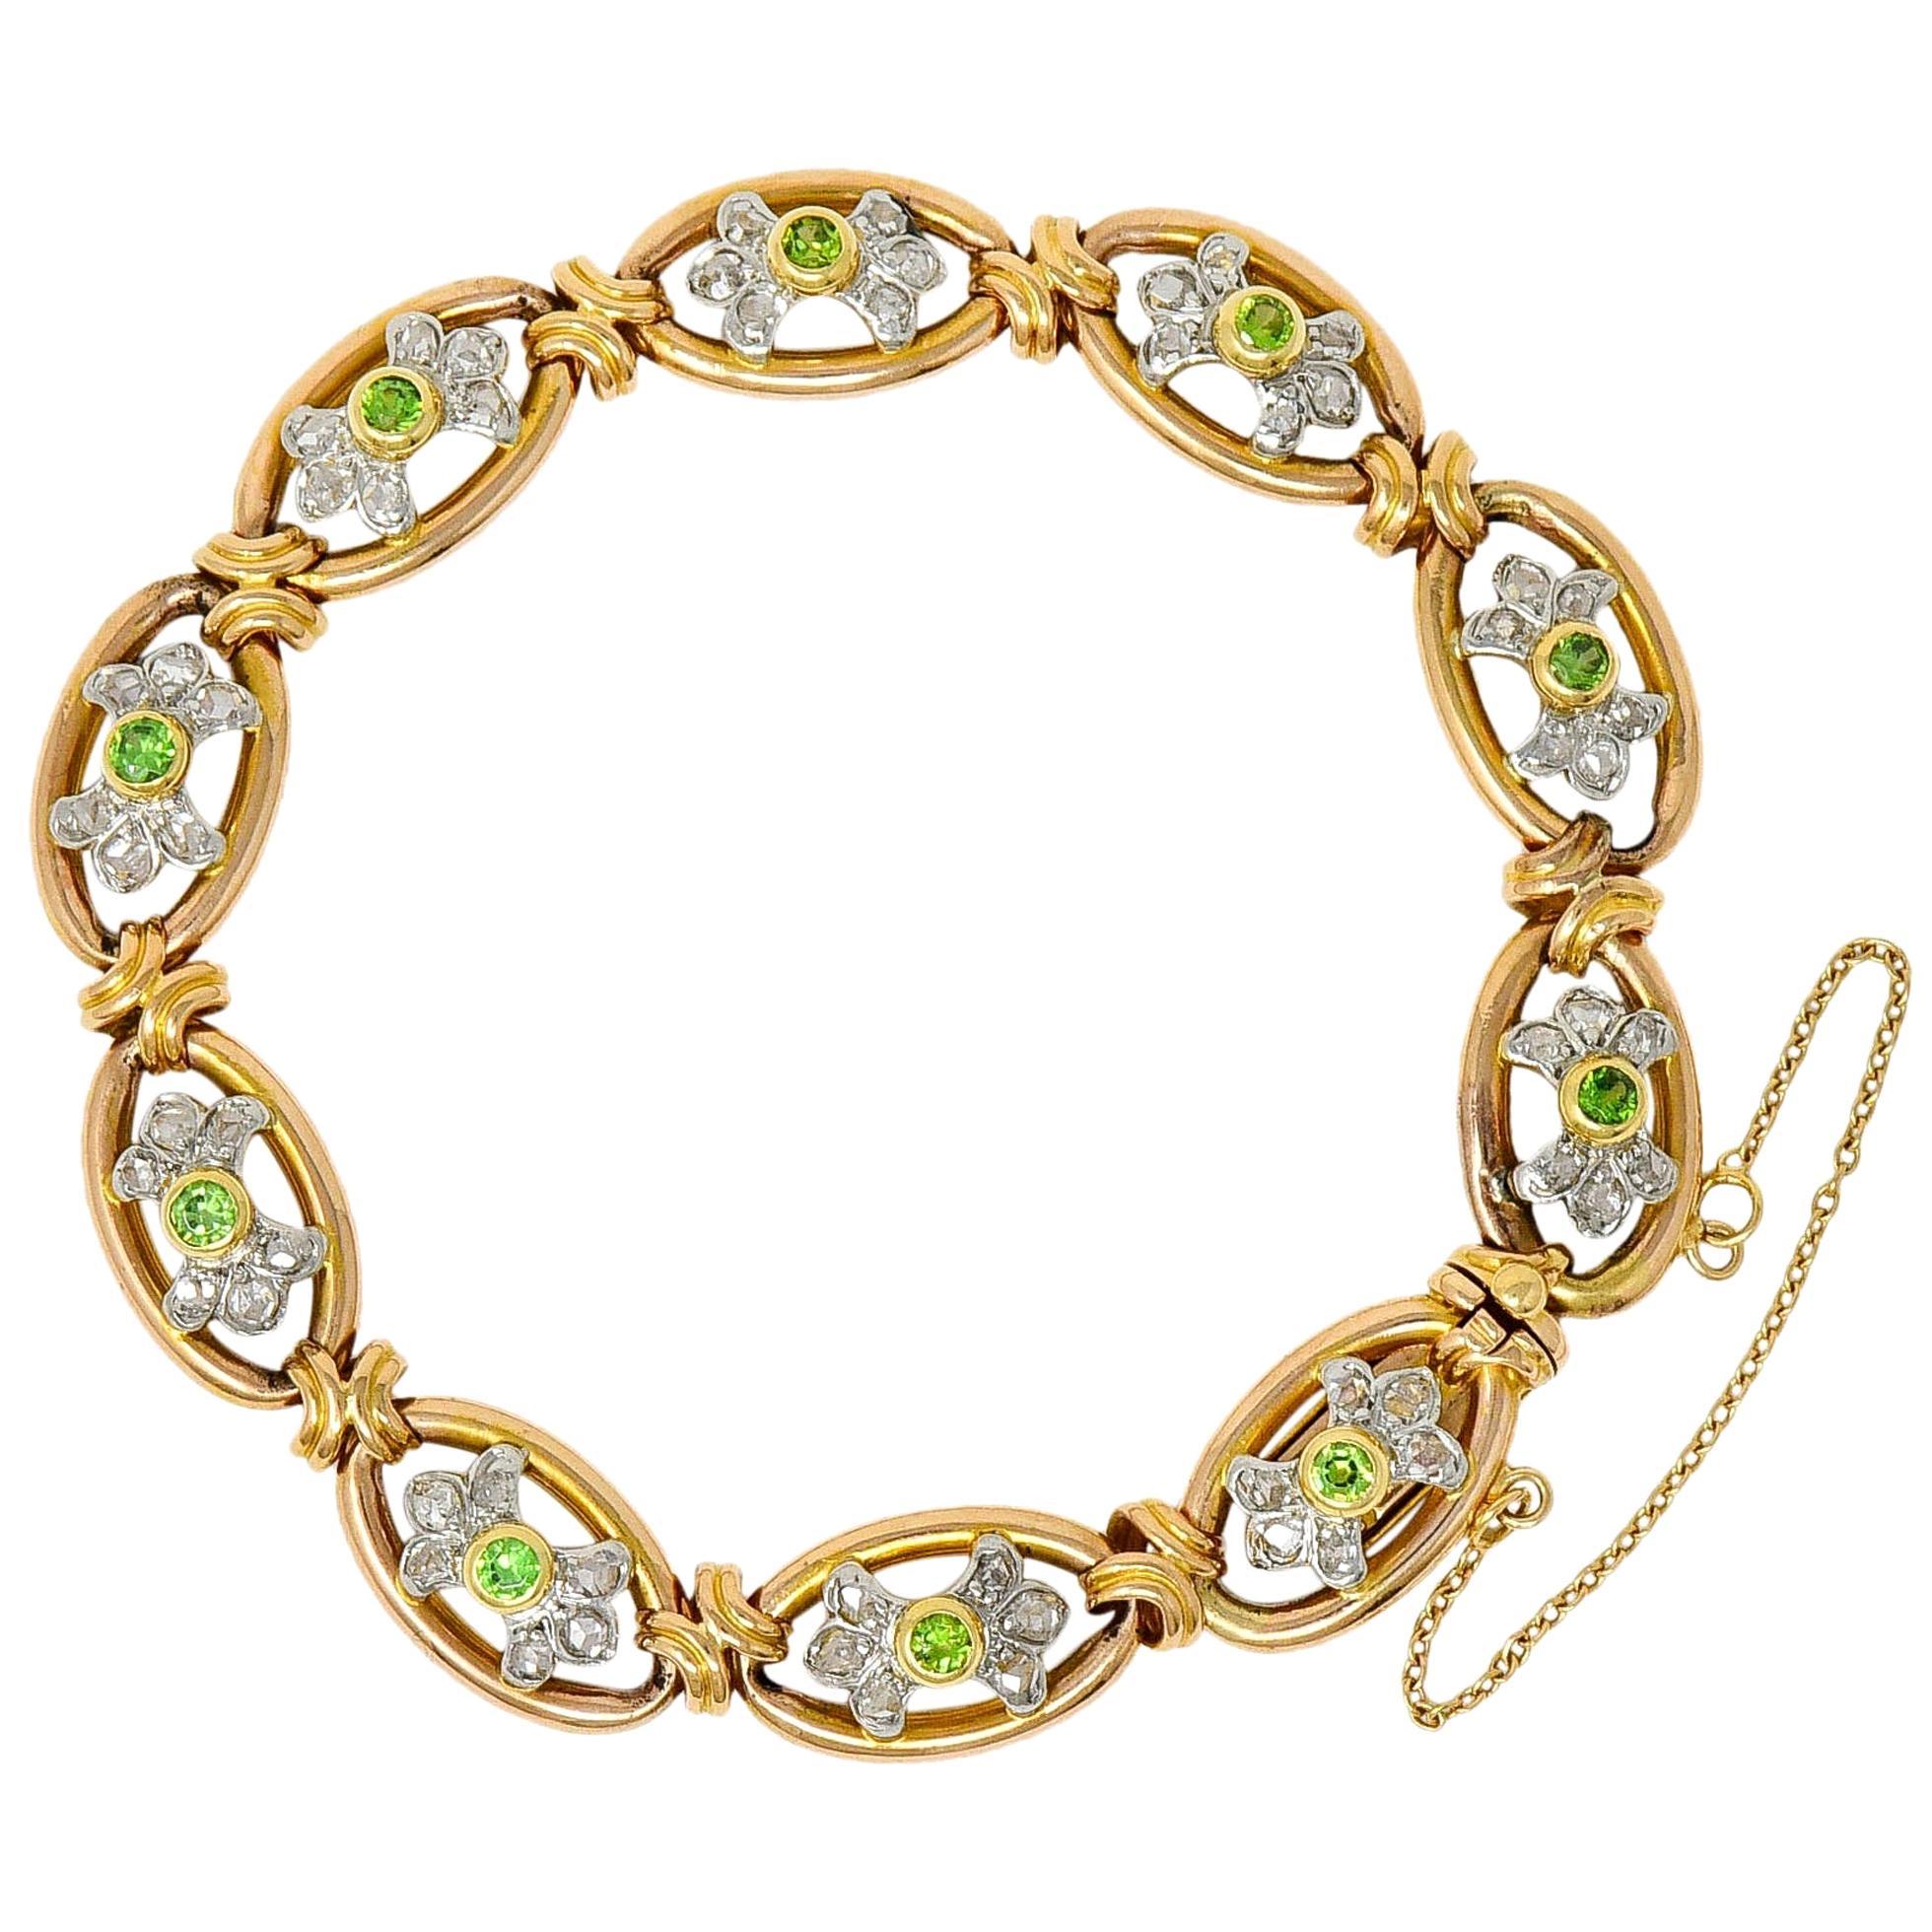 French Edwardian Demantoid Garnet Diamond Platinum-Topped 18 Karat Gold Bracelet